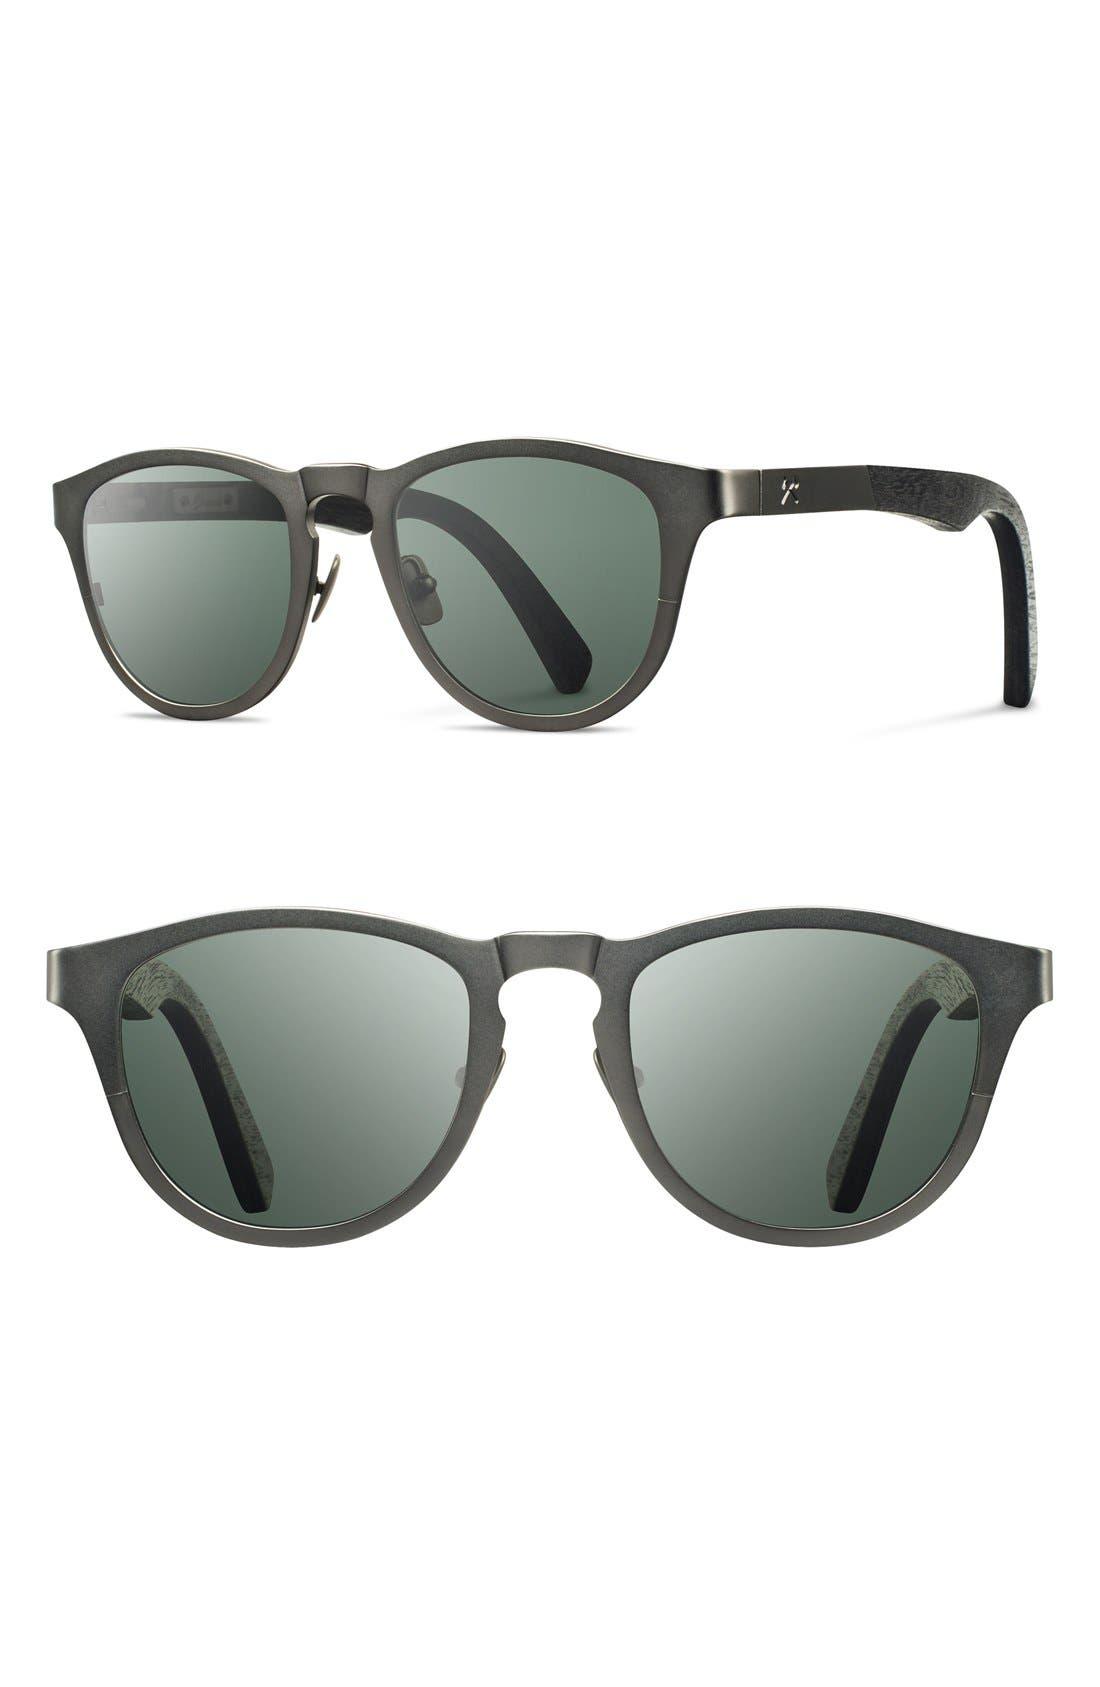 'Francis' 49mm Polarized Titanium & Wood Sunglasses,                         Main,                         color, Gunmetal/ Dark Walnut